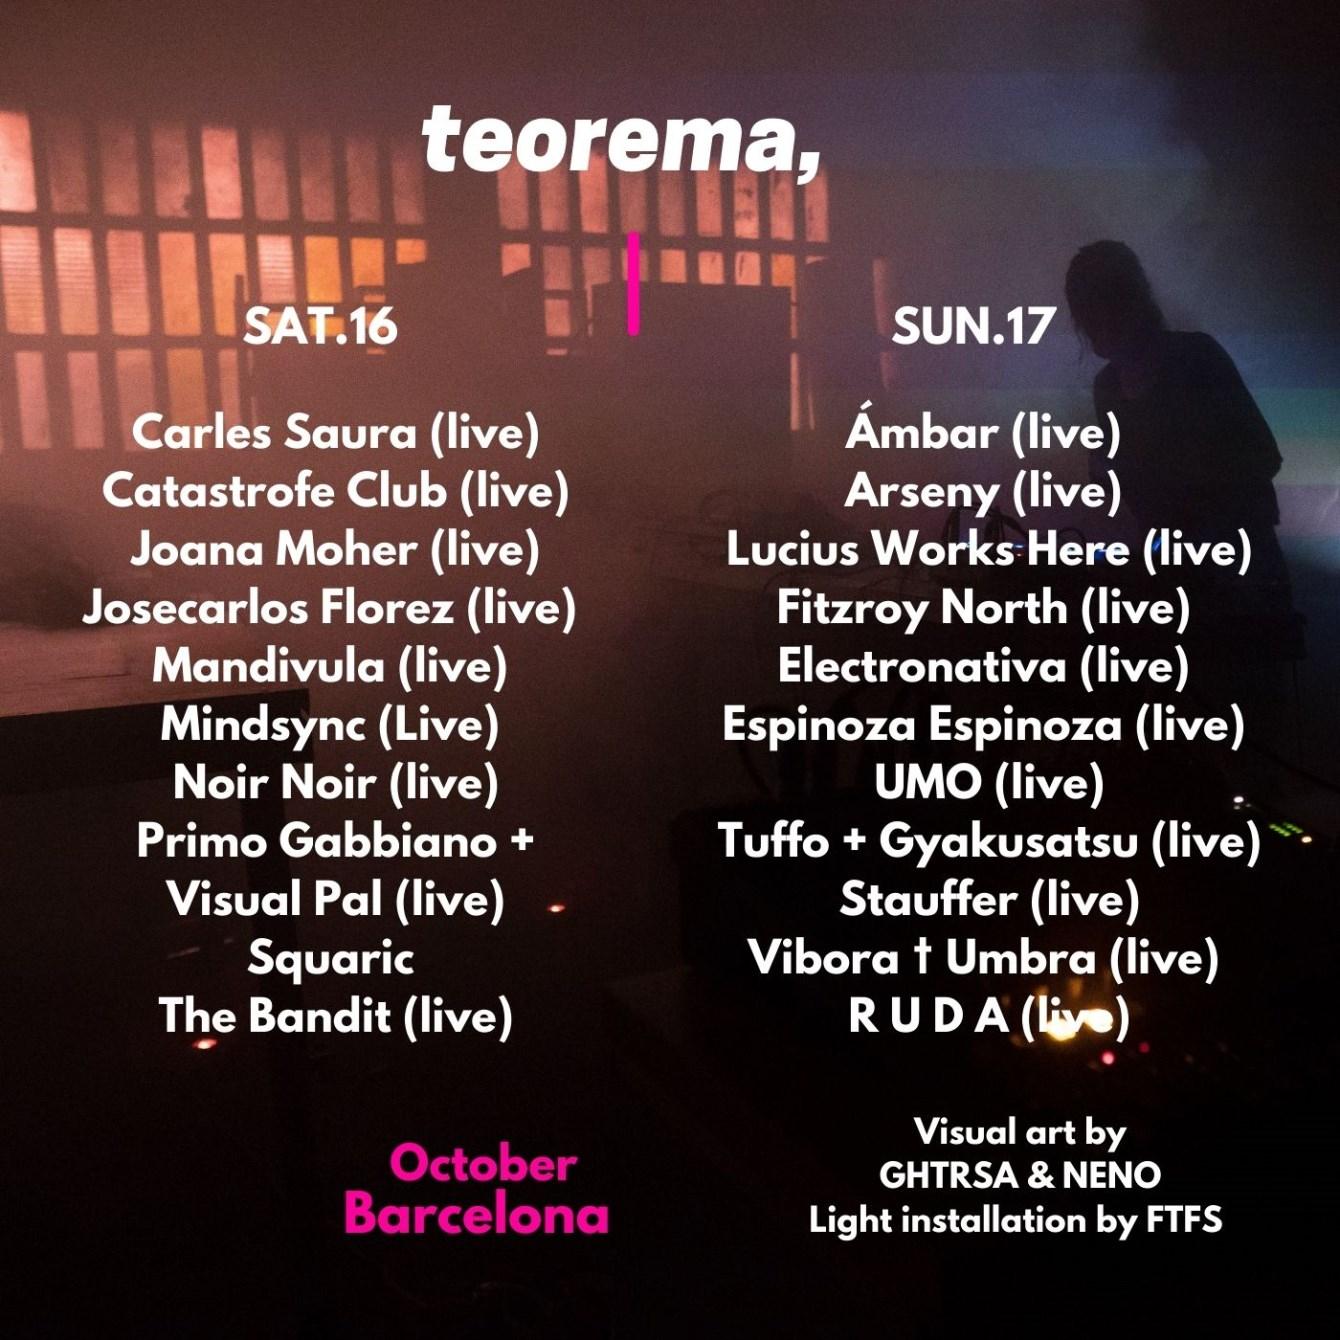 TEOREMA • Barcelona 2021 - Flyer back